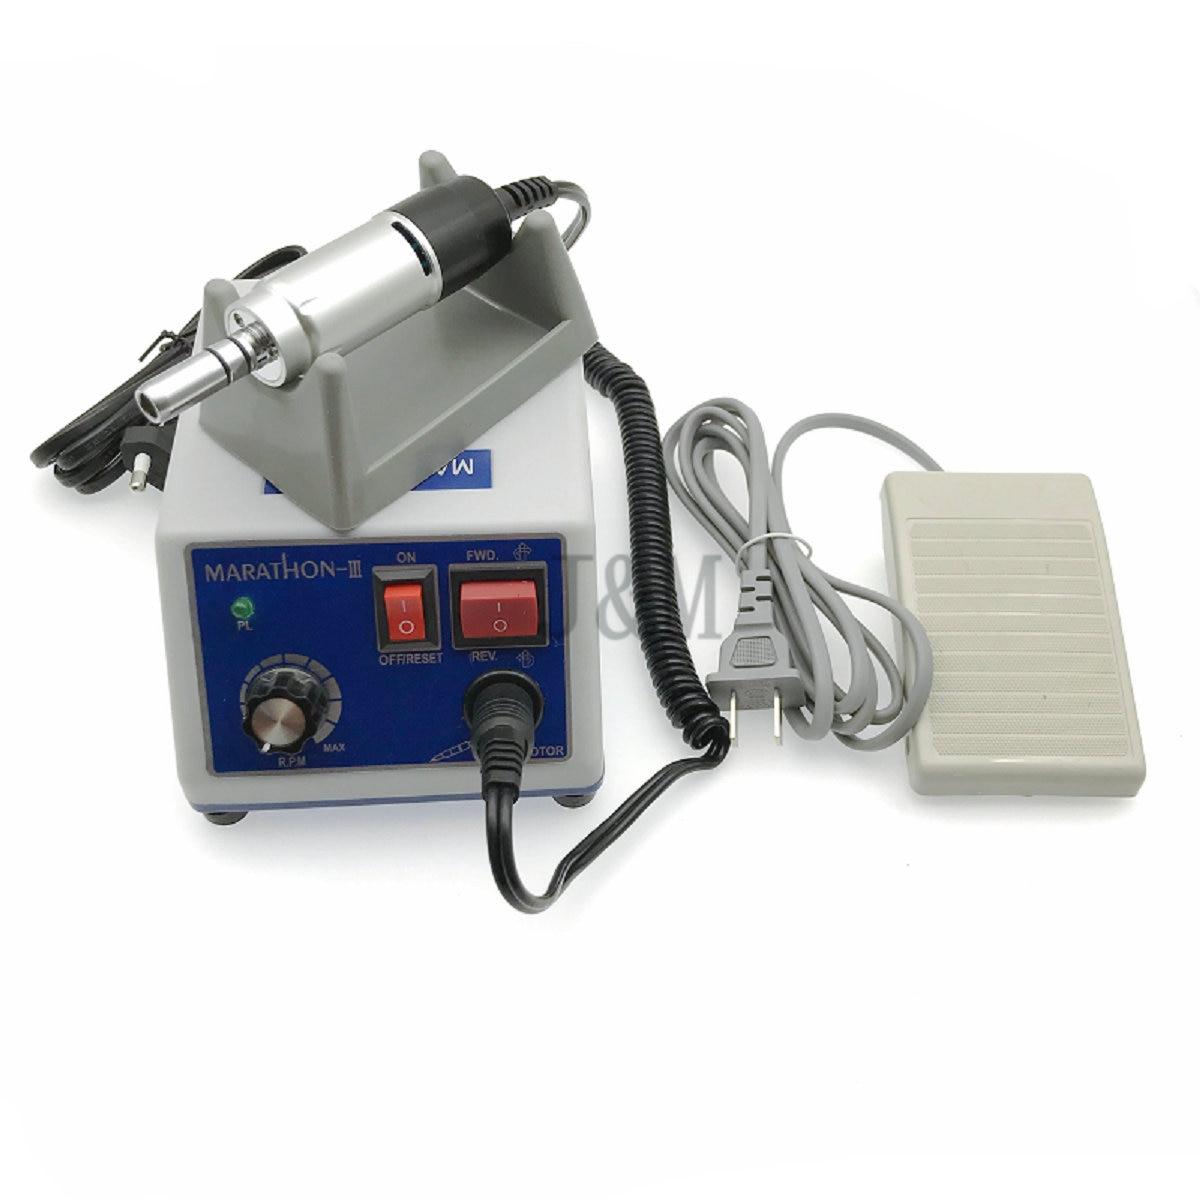 Dental Lab MARATHON Micromotor Machine N3 + Electric Micro Motor dental lab marathon micro motor polishing machine n3